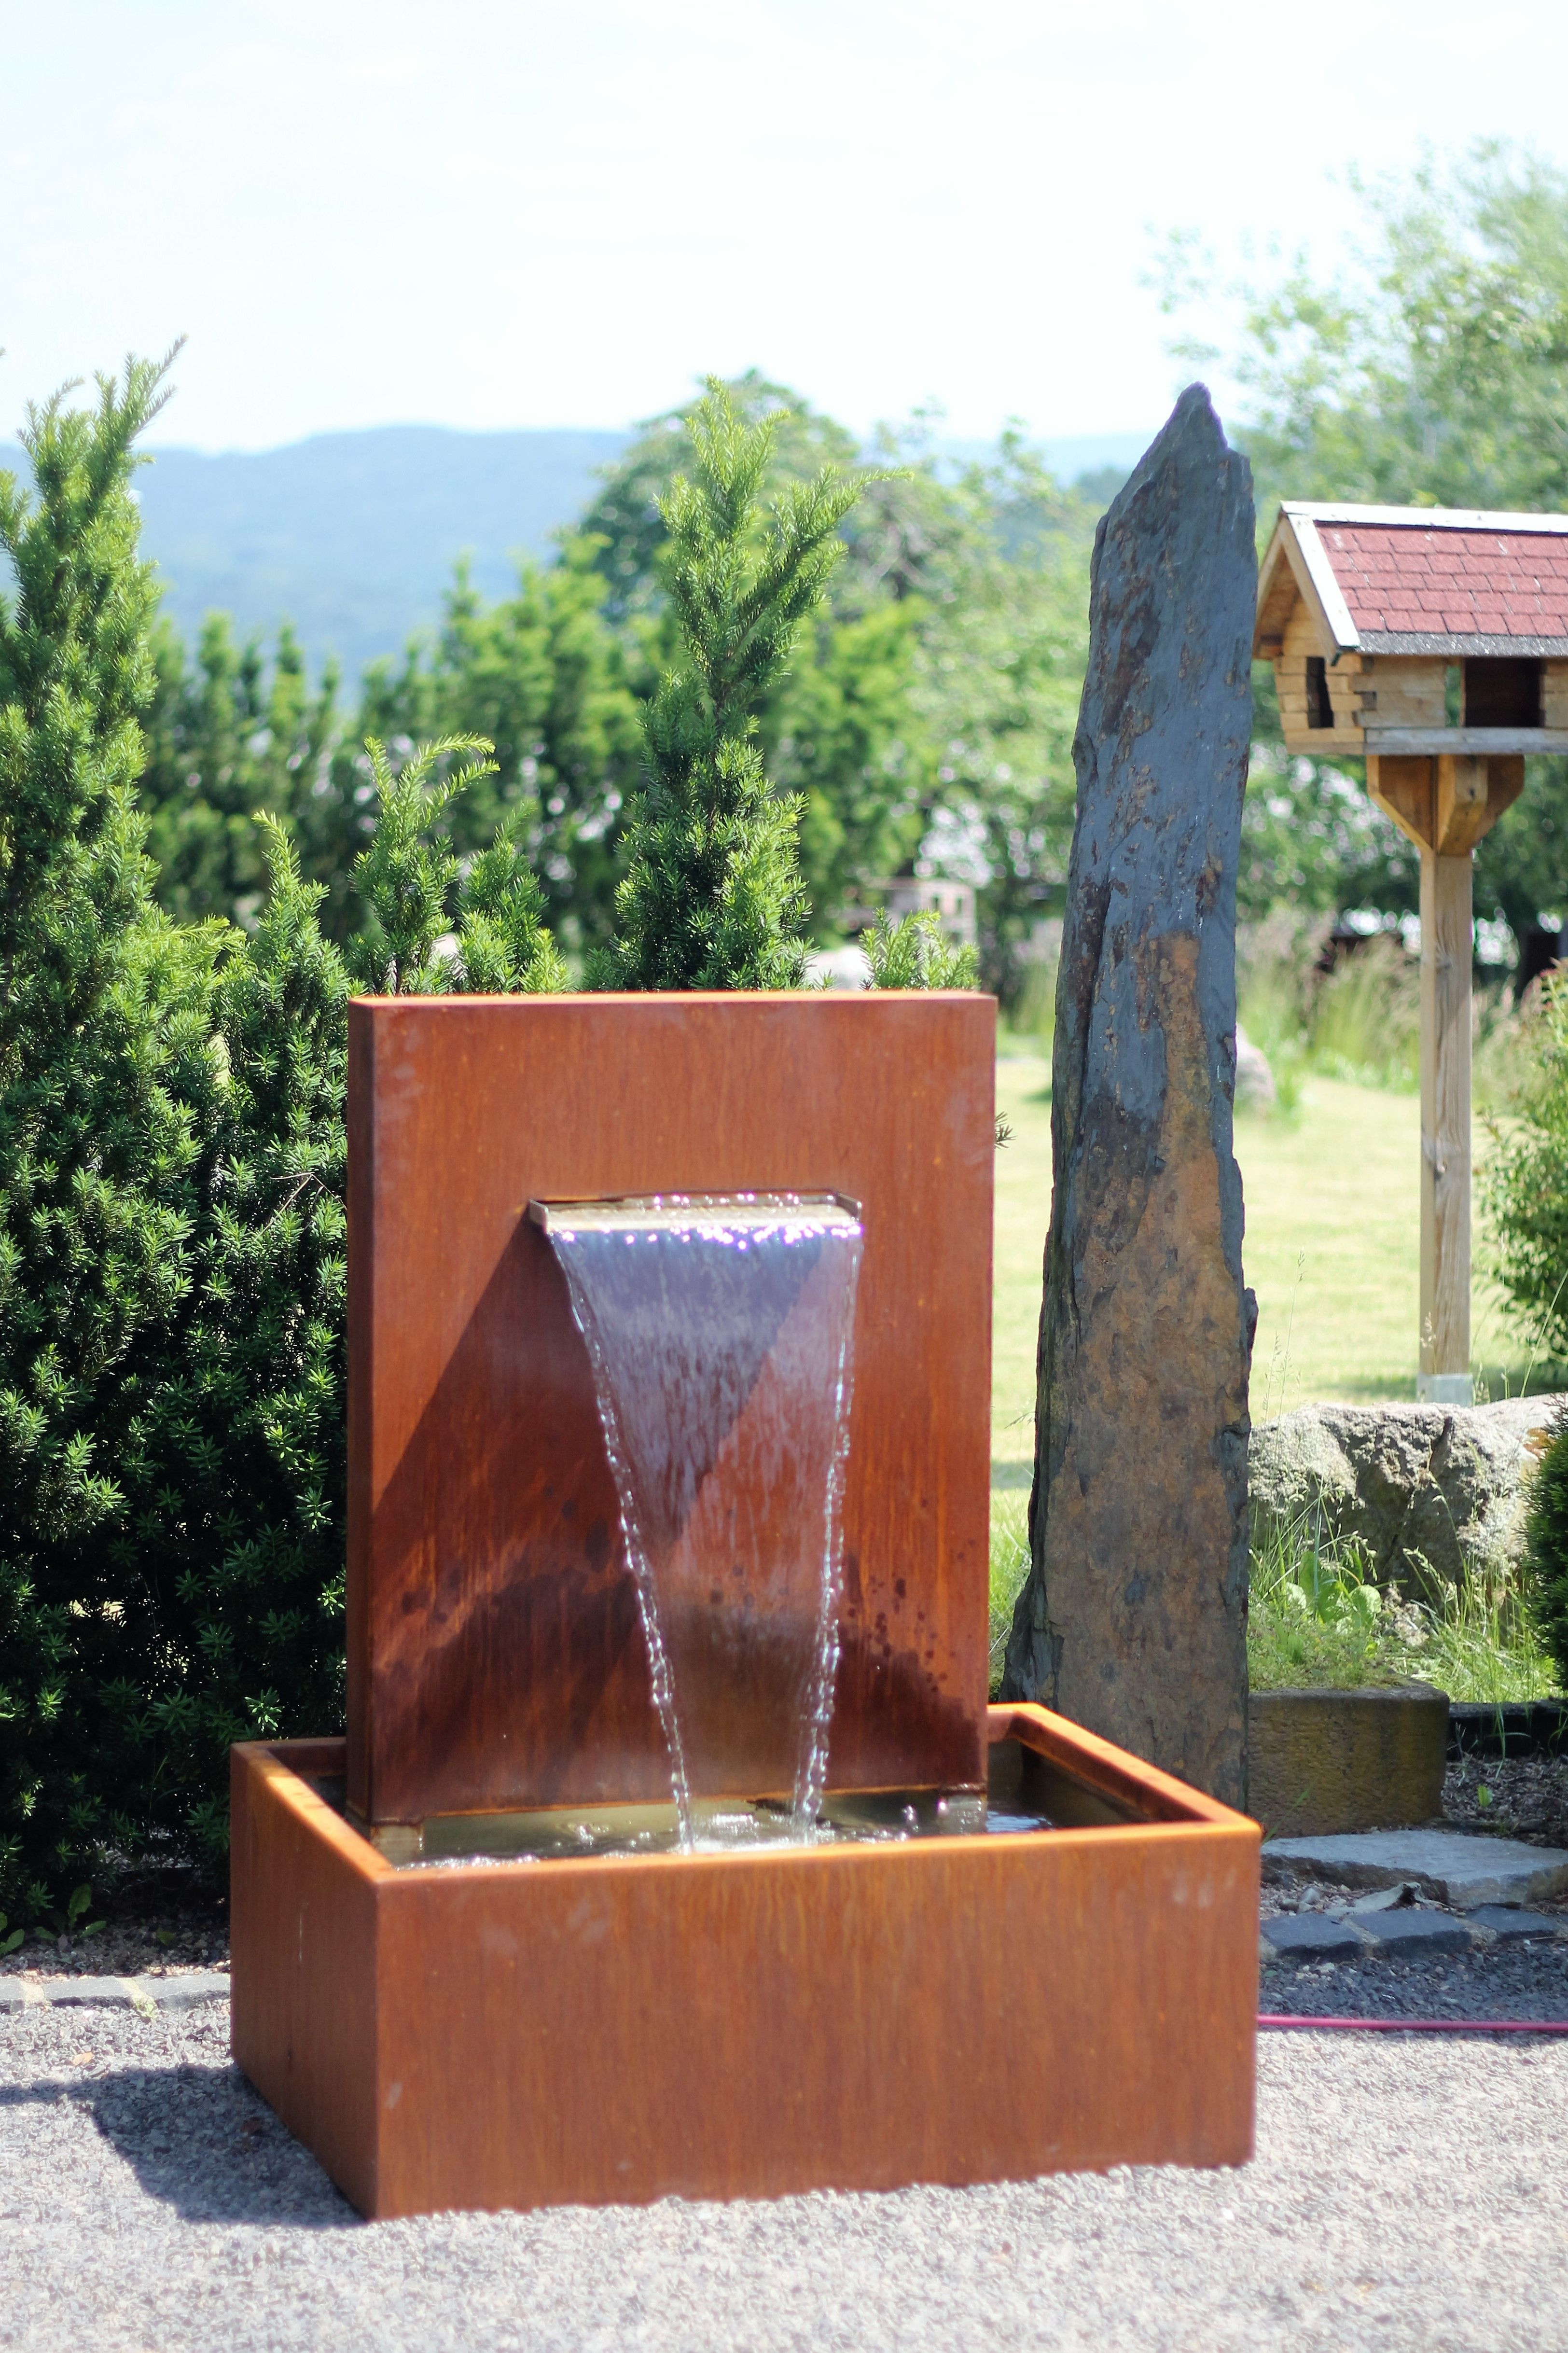 Wasserspiel Cortenstahl Wasserfall 30 Im Edelrost Design Inkl Pumpe Www Brunnenschmiede De Shoplink Http Brunnenk Wasserspiel Garten Gartenbrunnen Edelrost